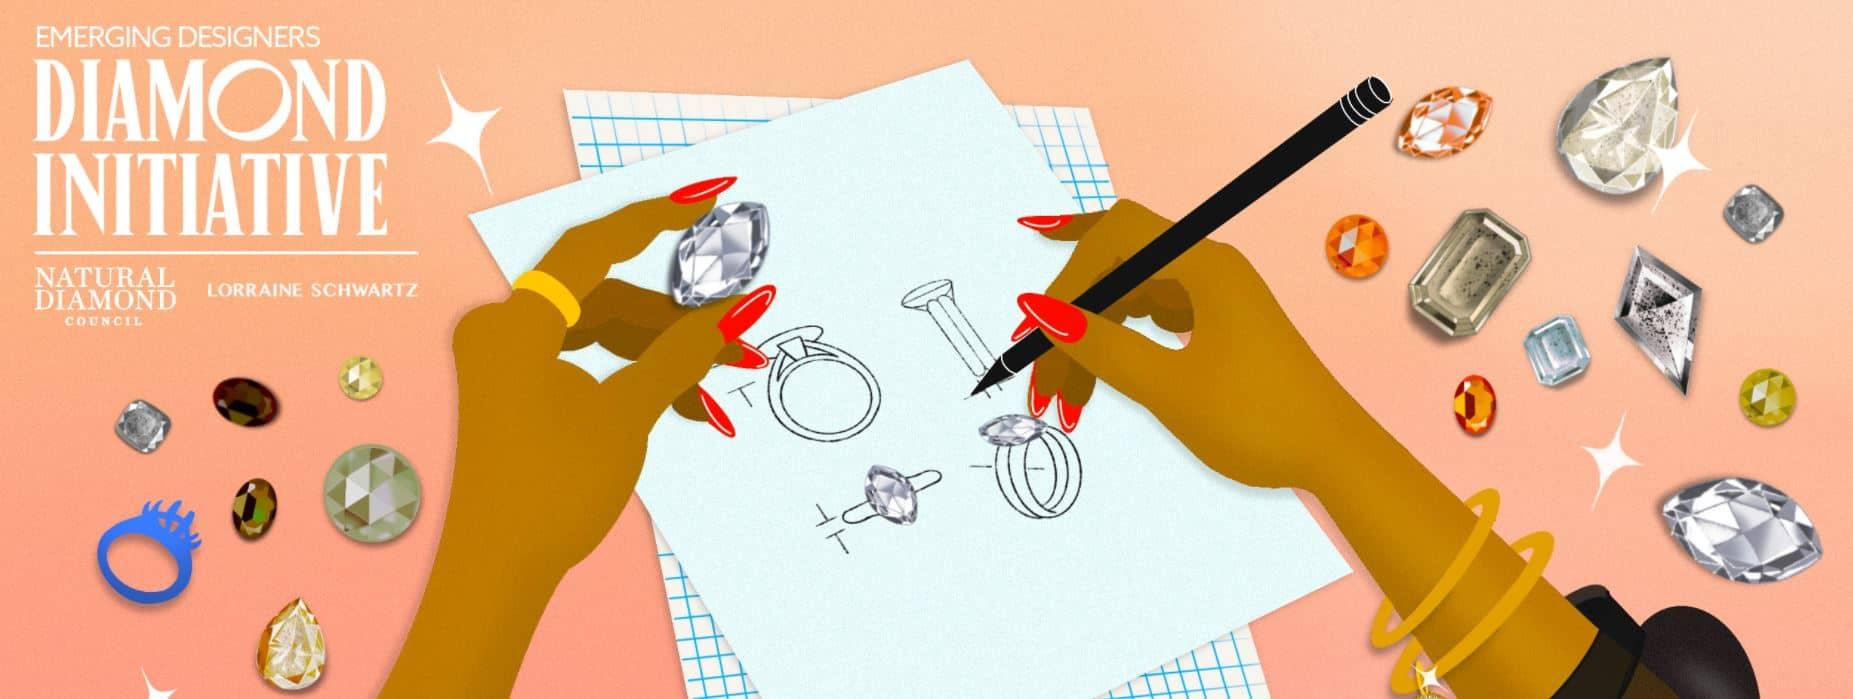 Emerging Designers Diamond Initiative by NDC